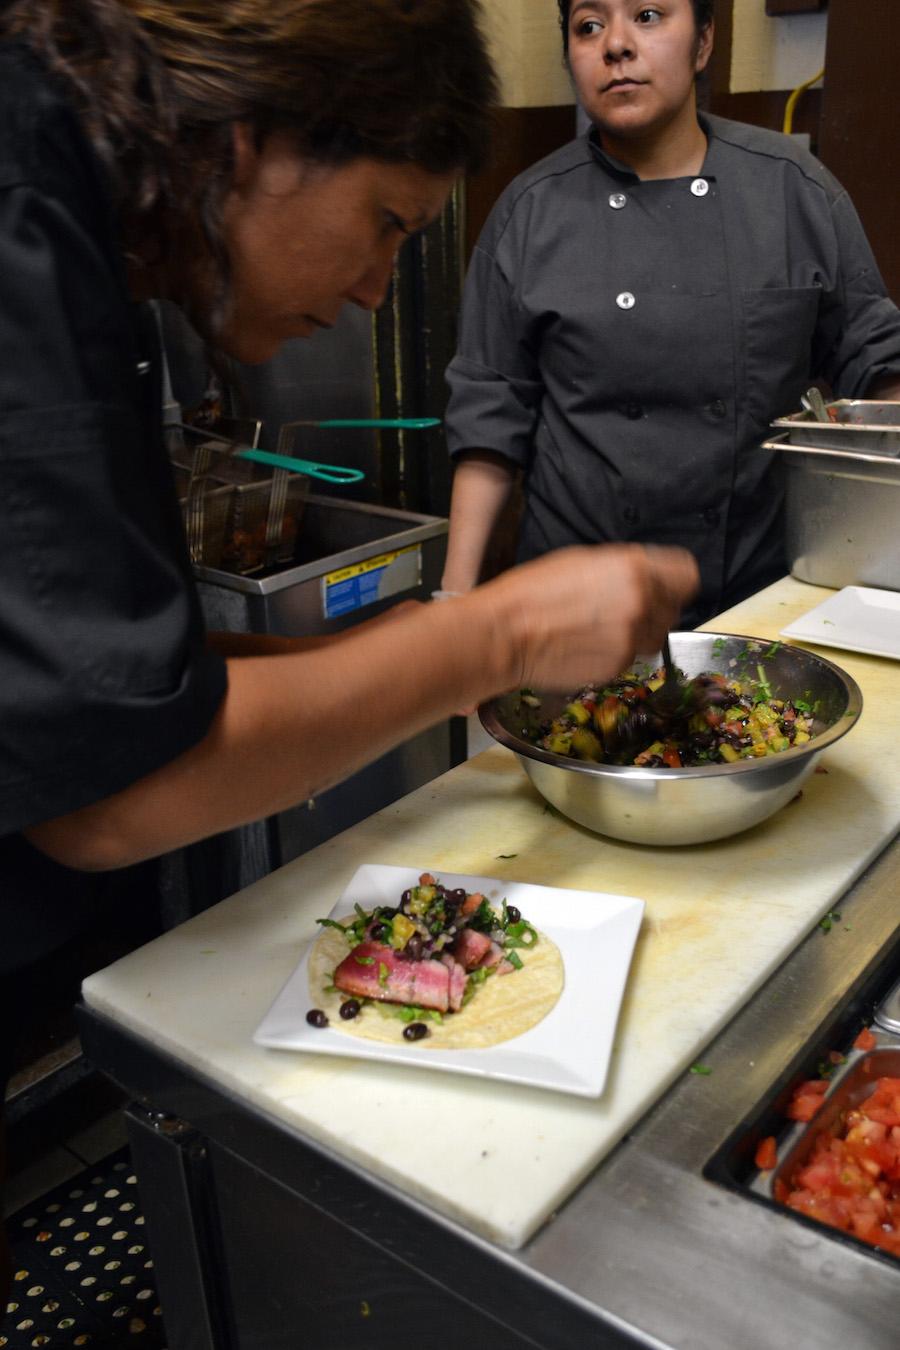 Salazar prepares tacos for Te Amo Tequila's new menu alongside Chef Elisa Cordero of Barracuda.